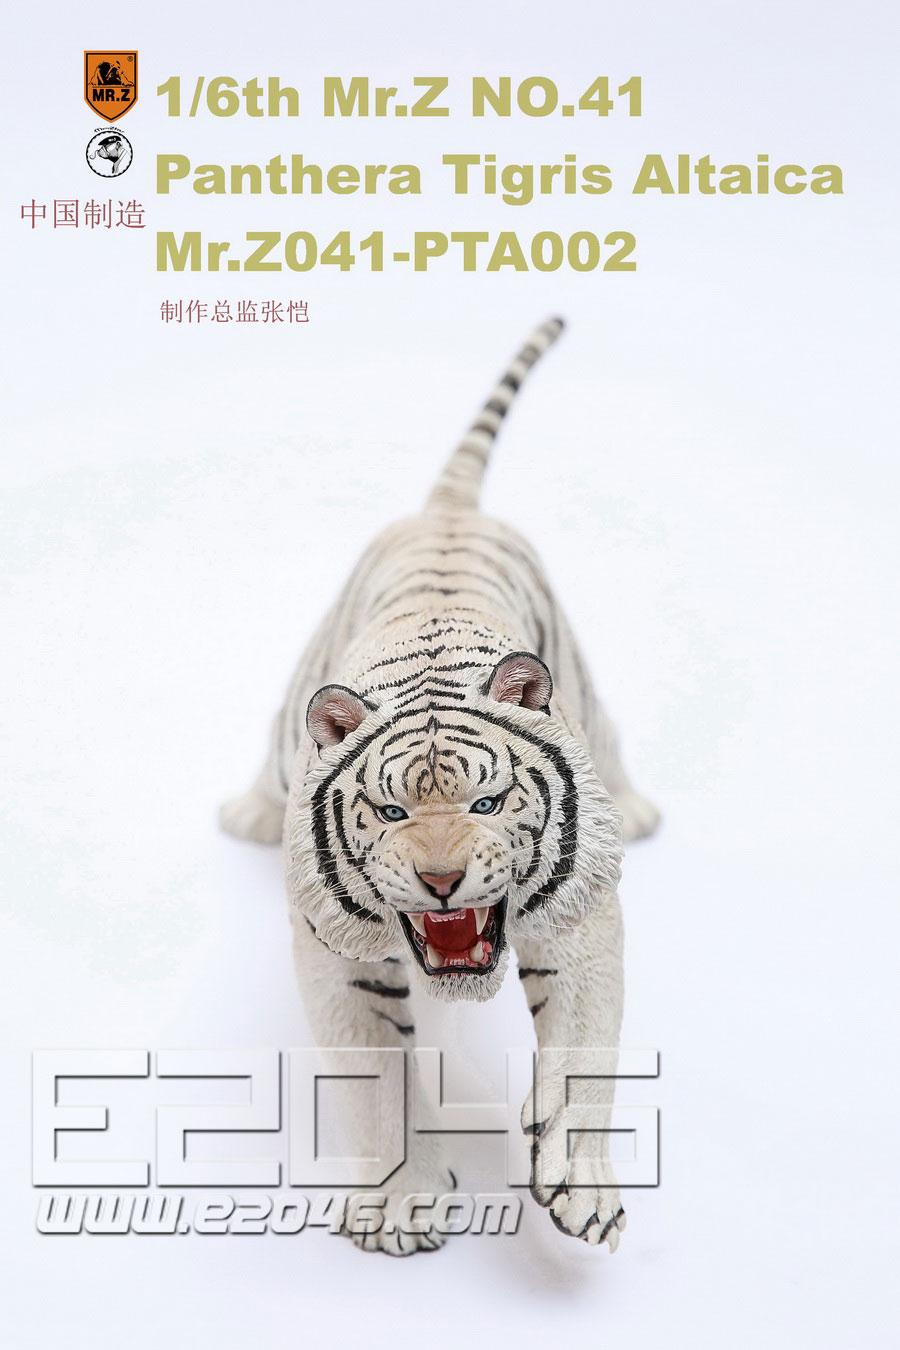 Panthera Tigris Altaica B (DOLL)